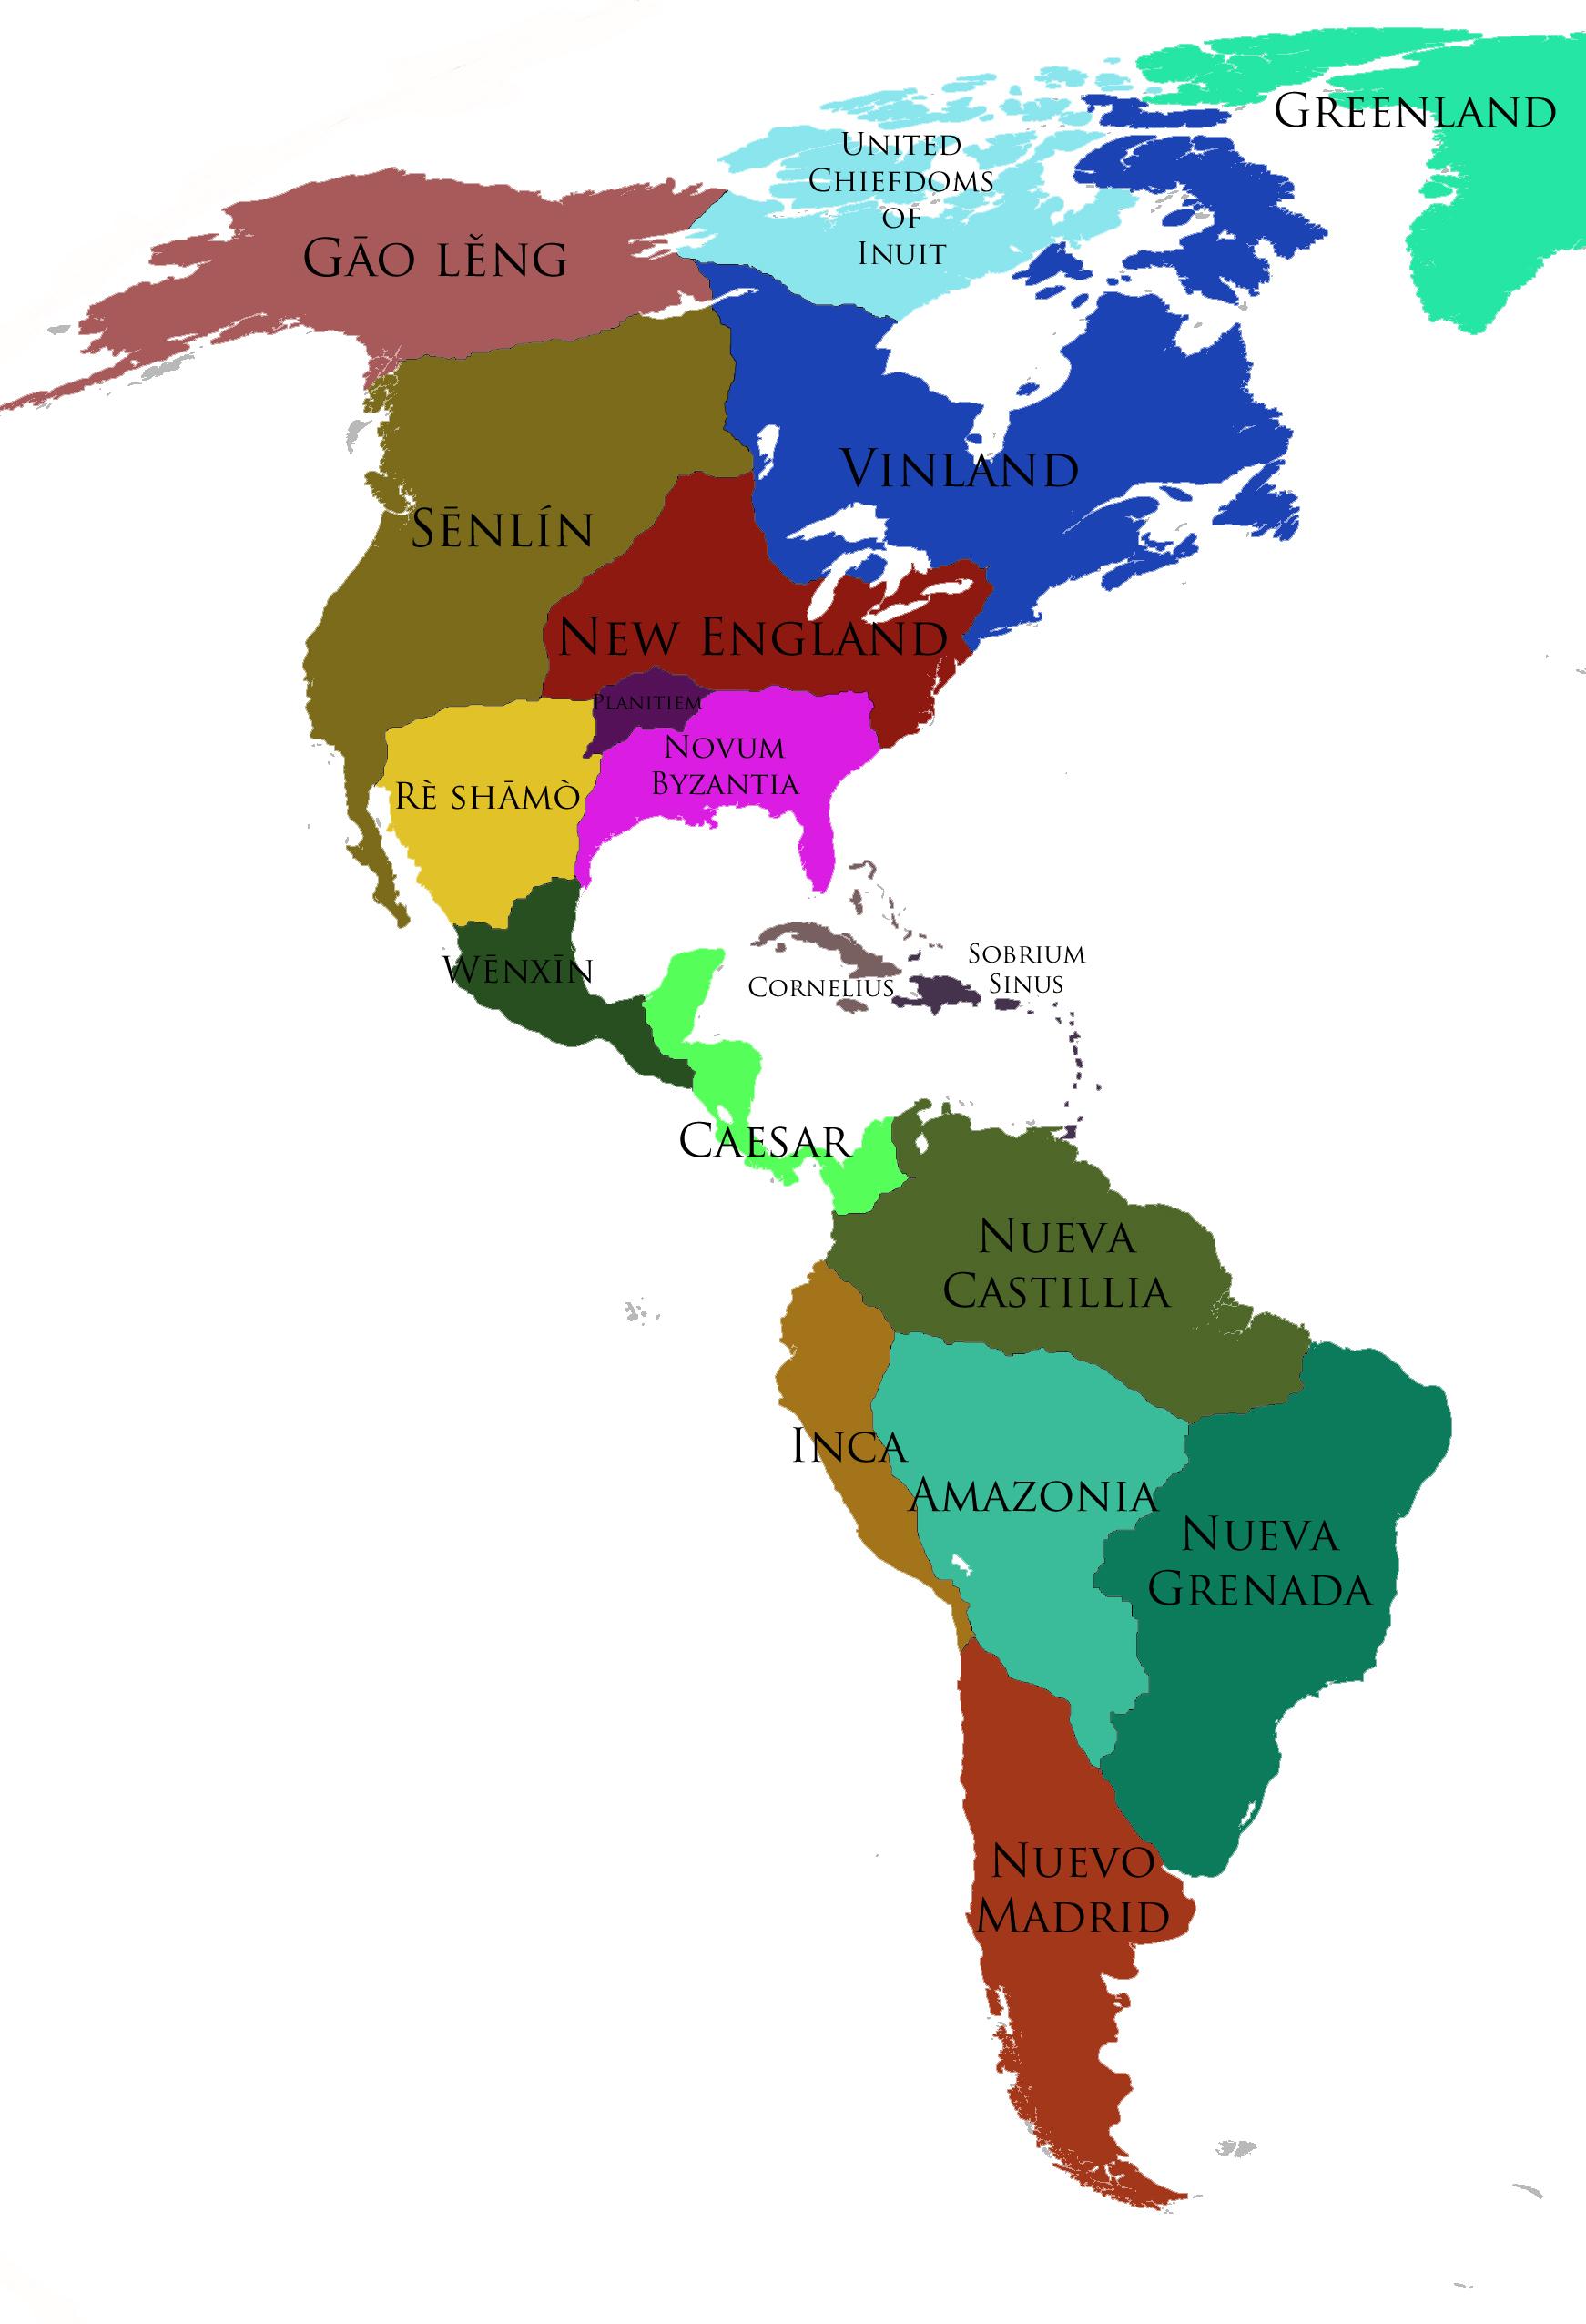 Full_Map_Both_Americas_VINW